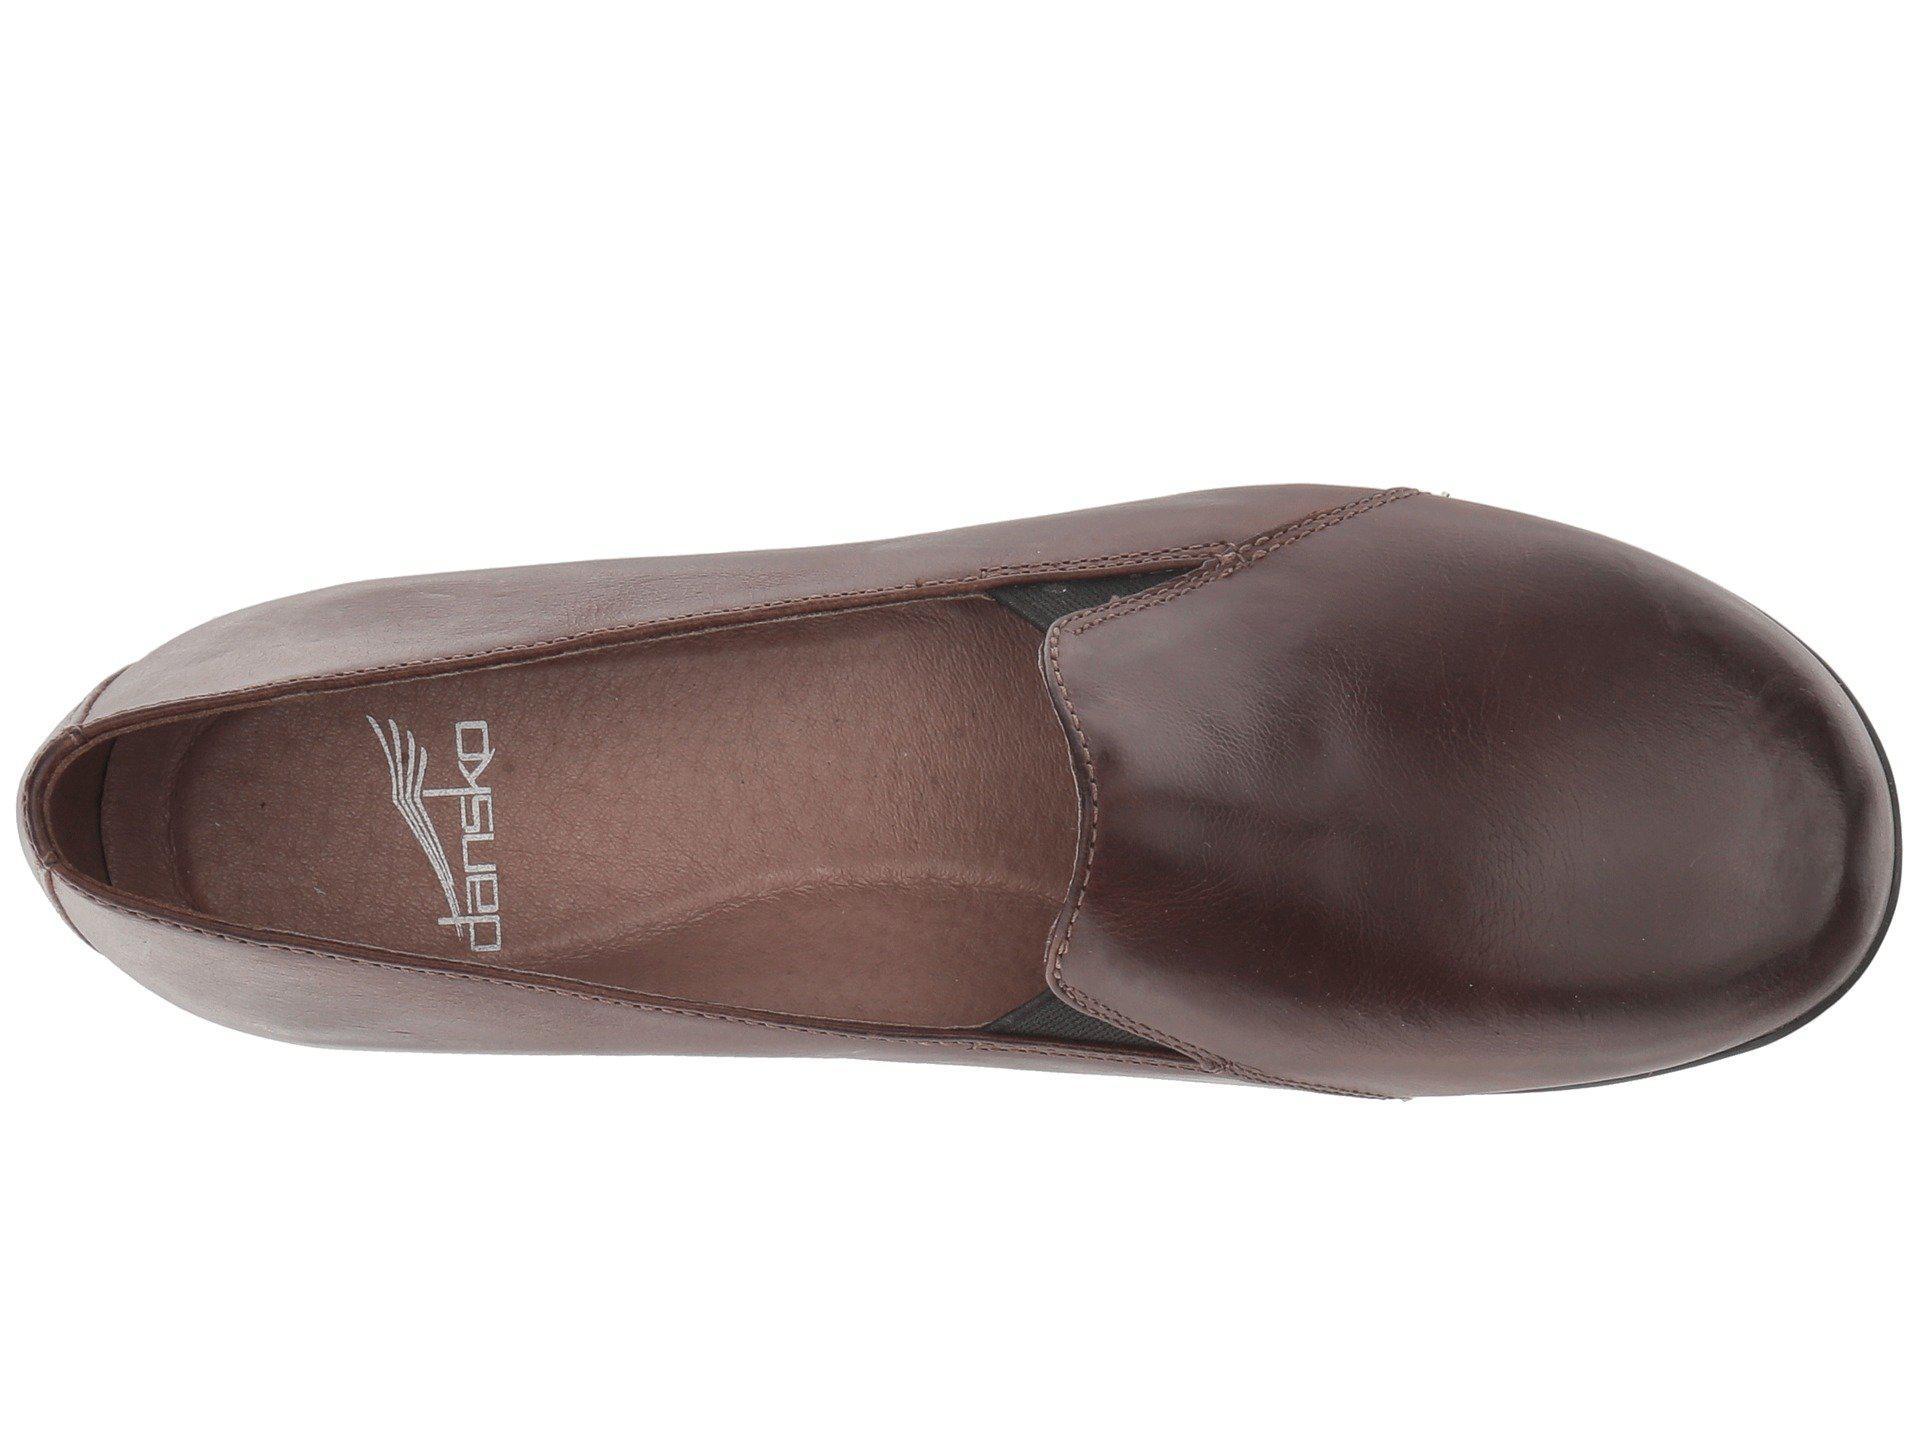 f3993603478 Dansko - Brown Farah (black Milled Nappa) Women s Shoes - Lyst. View  fullscreen